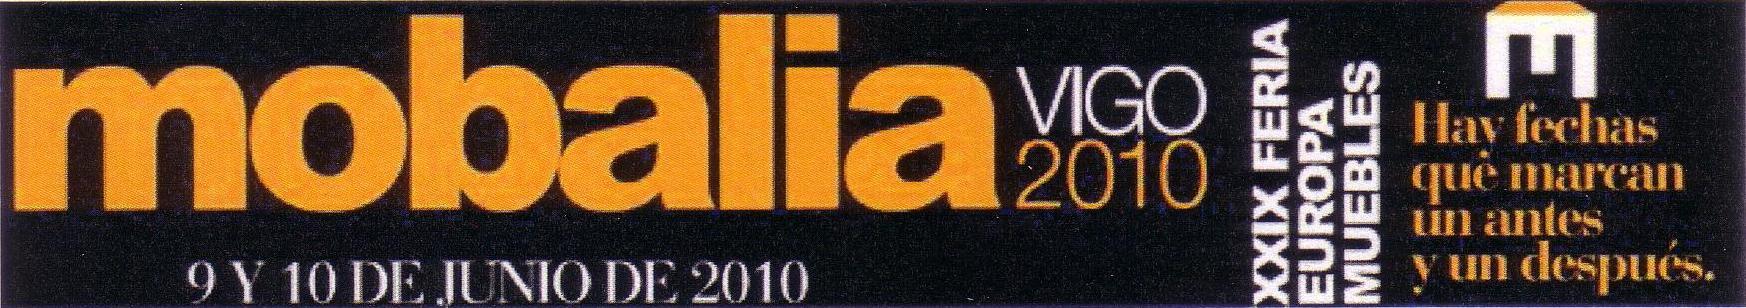 Cartel promocional Mobalia Vigo 2010